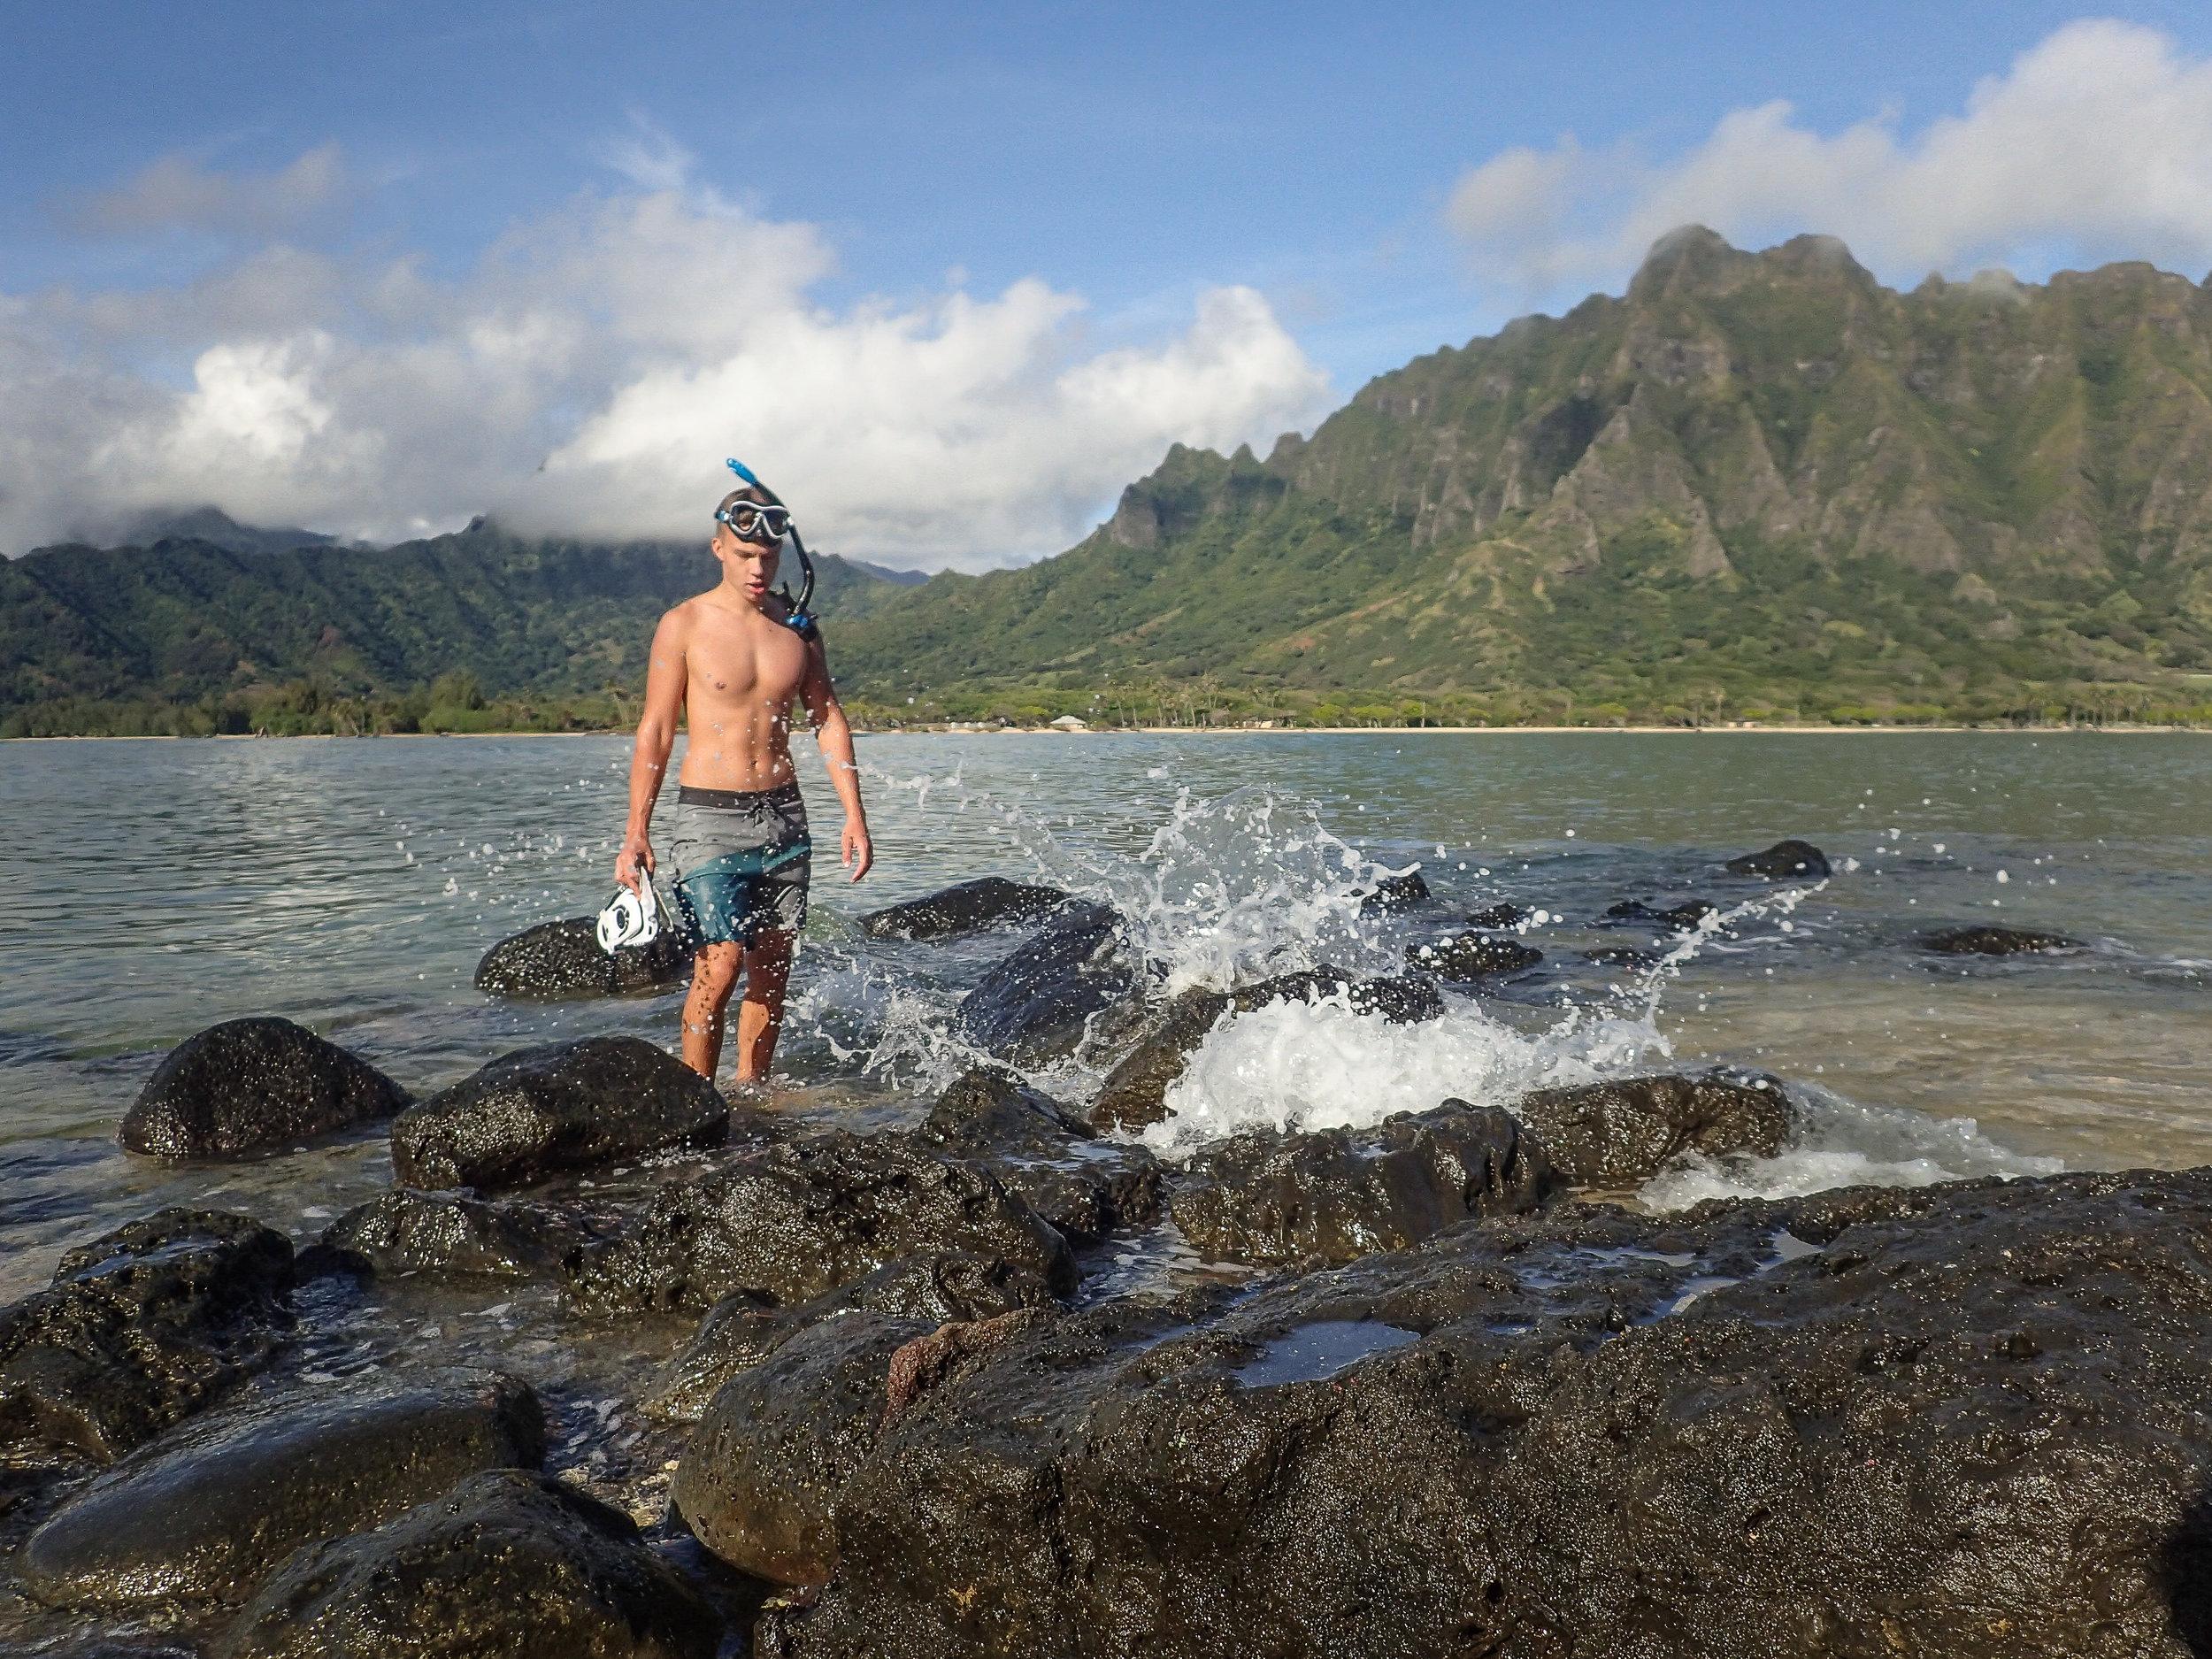 P_Tr_HI_Oahu_Olympus Images-237.jpg